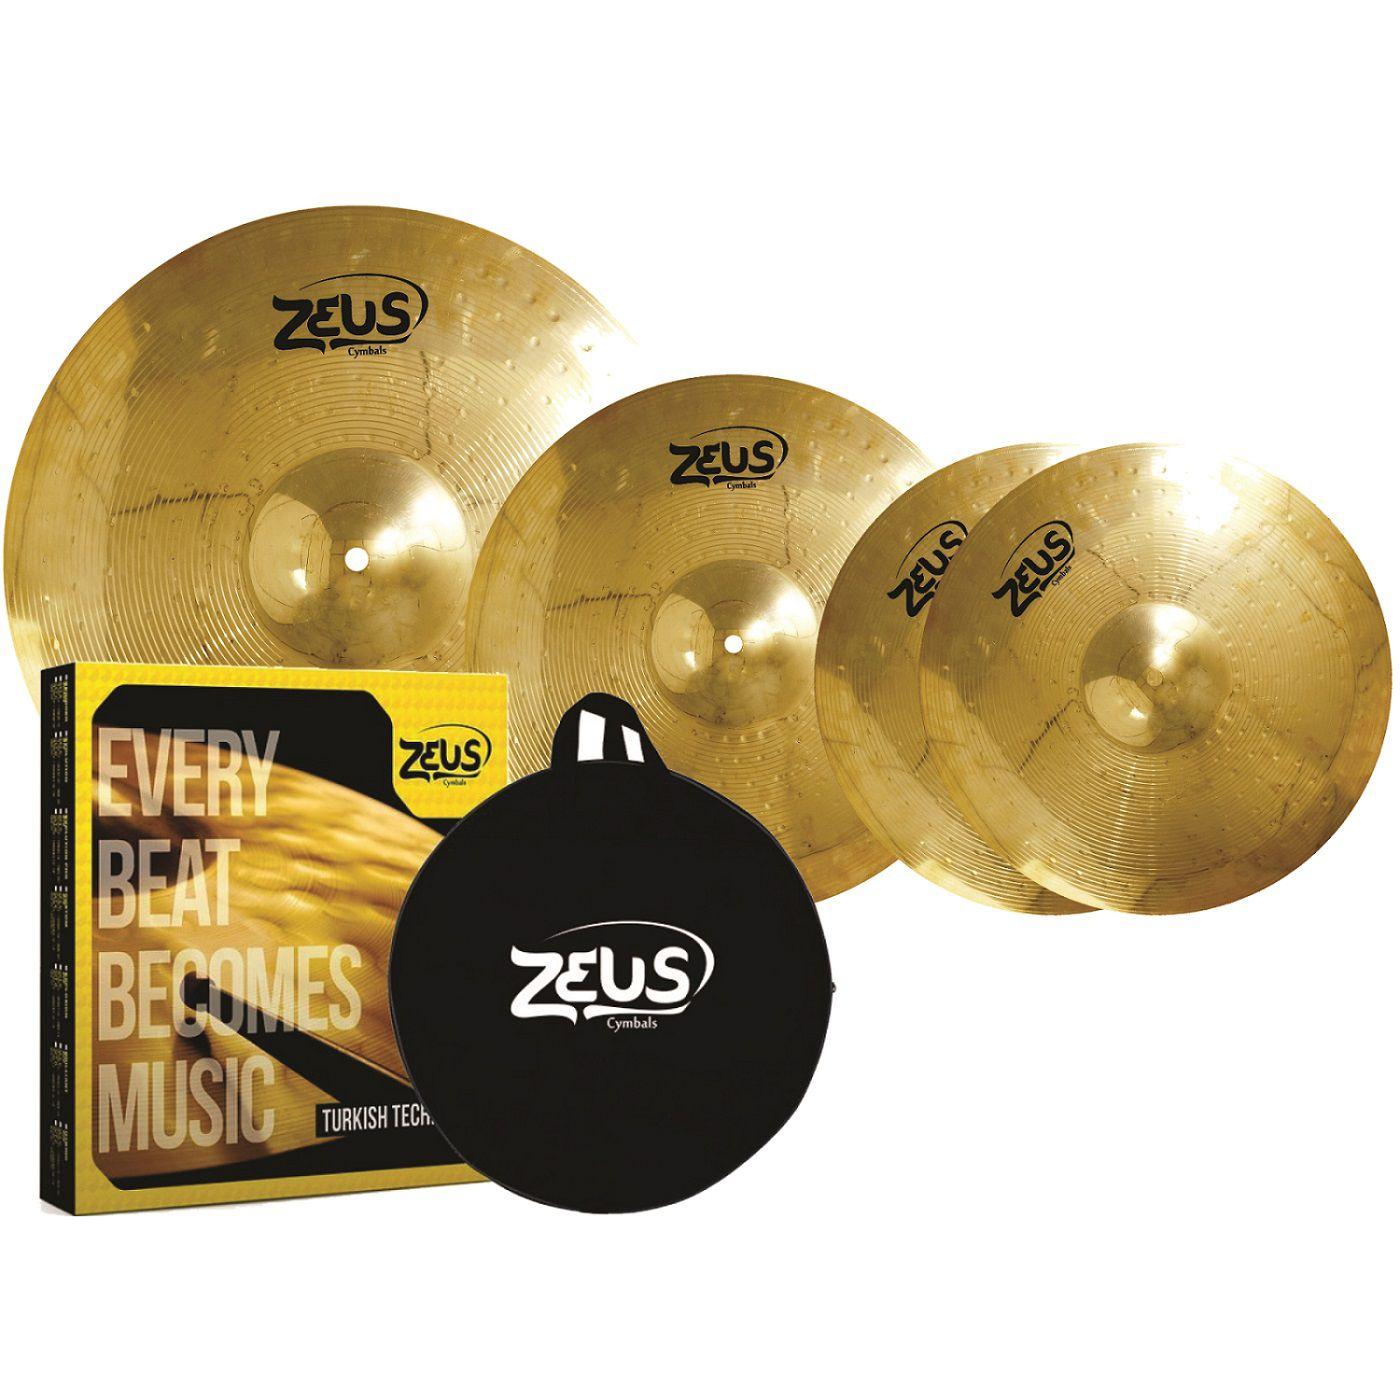 Kit De Prato Zeus Beginner Brass Set C 14 16 20 Com Bag